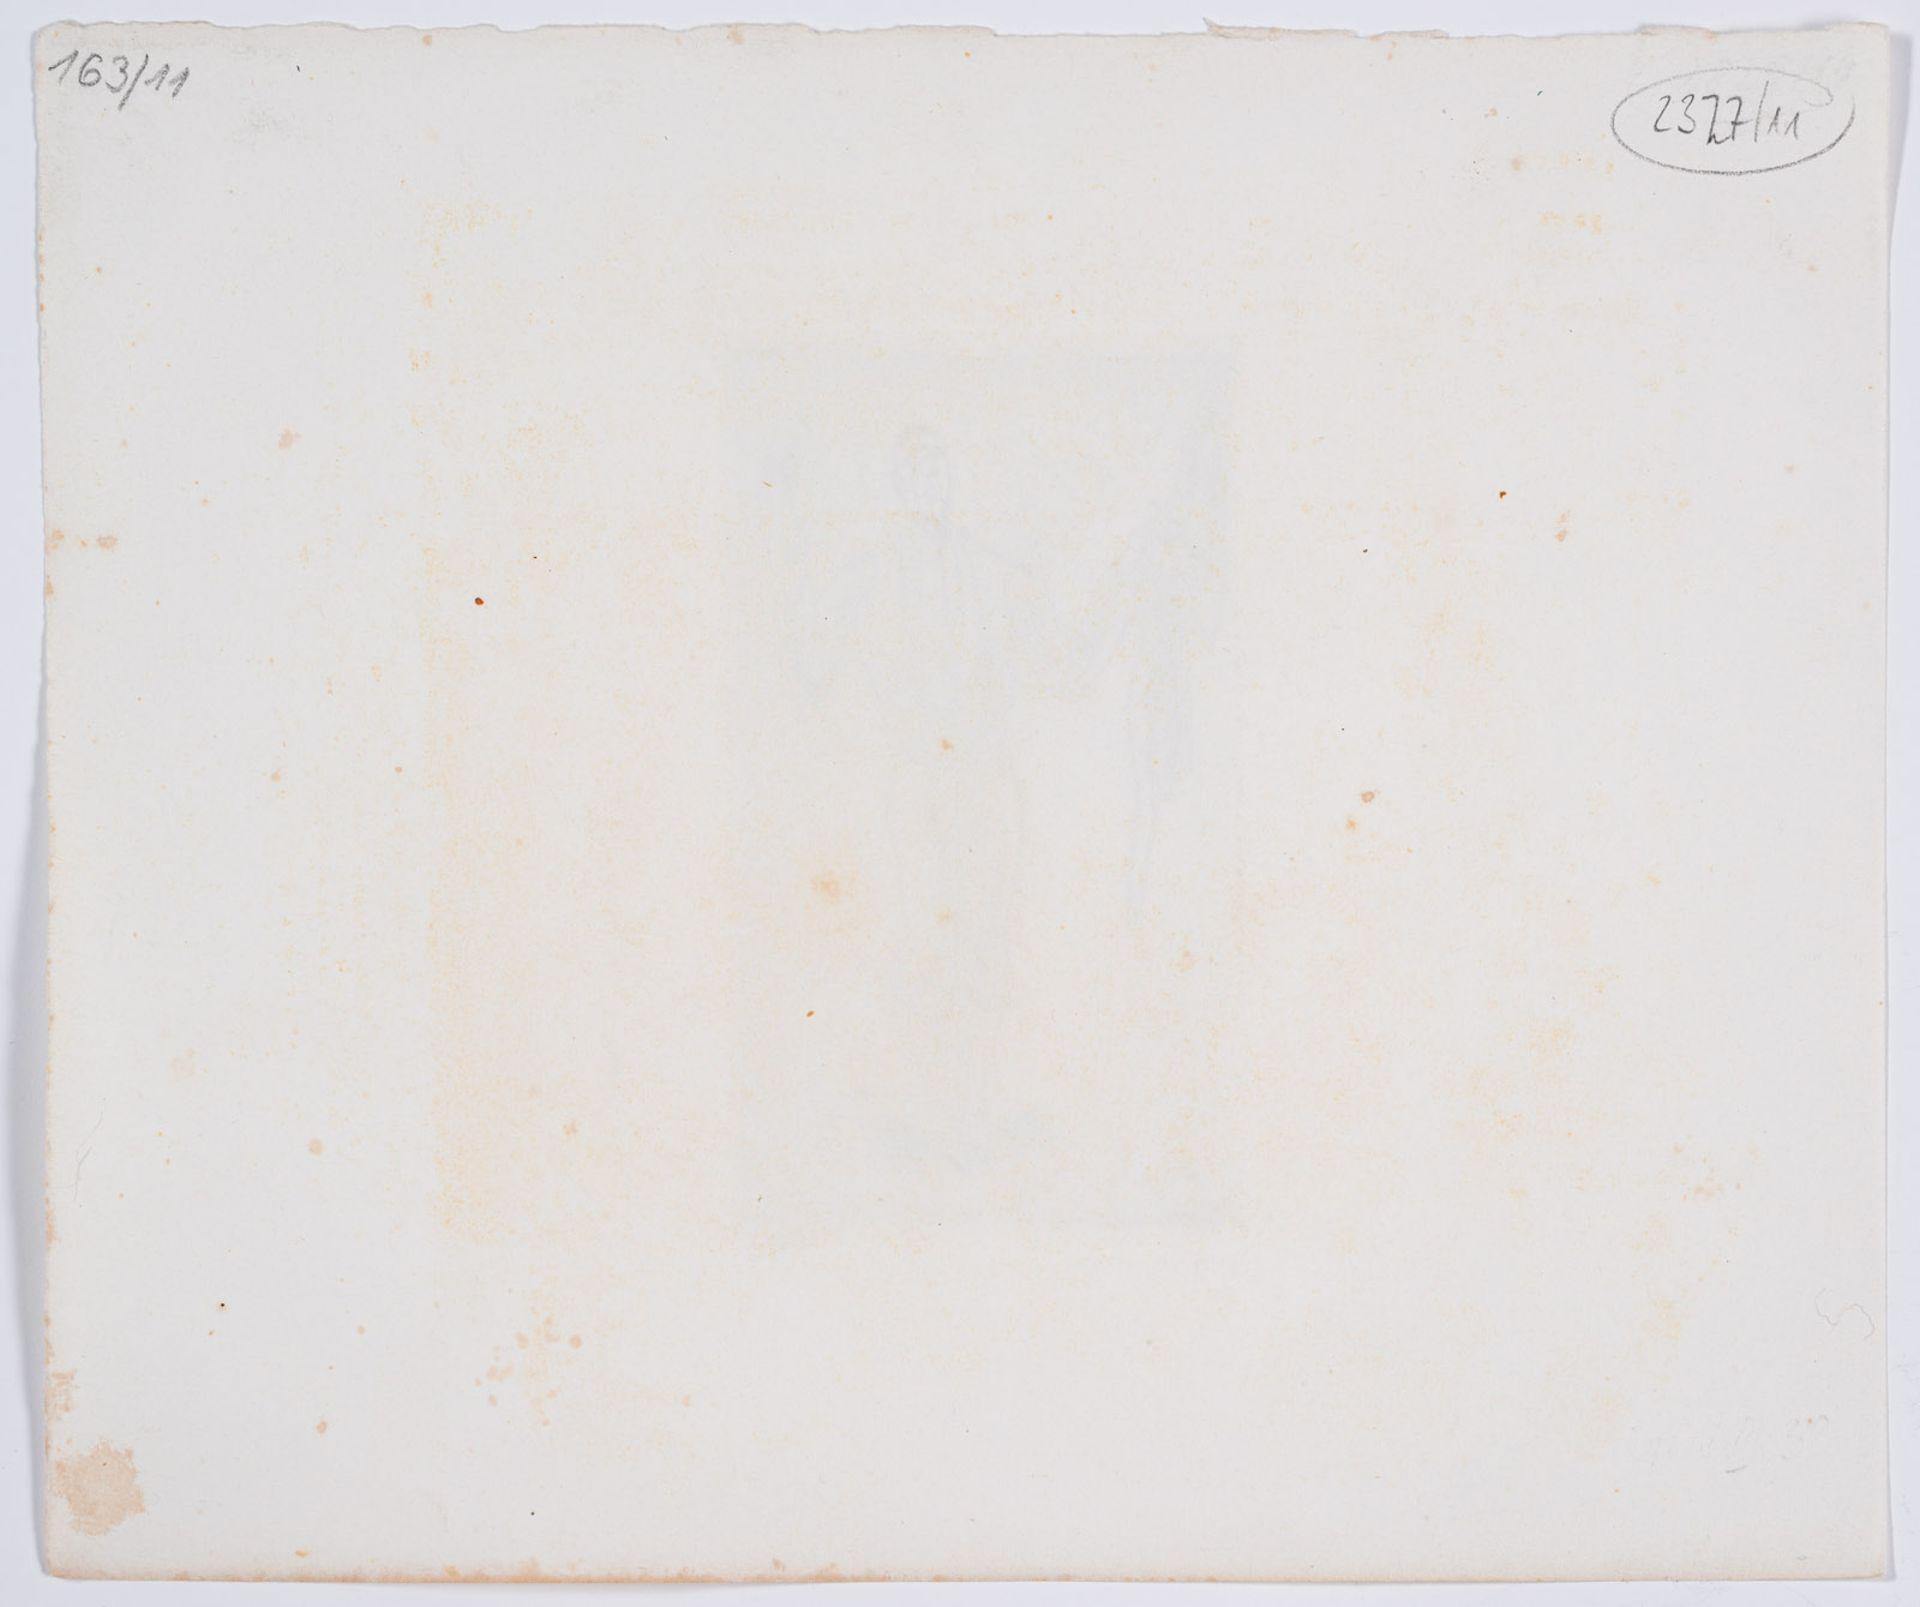 Geiger, Willi - Image 2 of 22